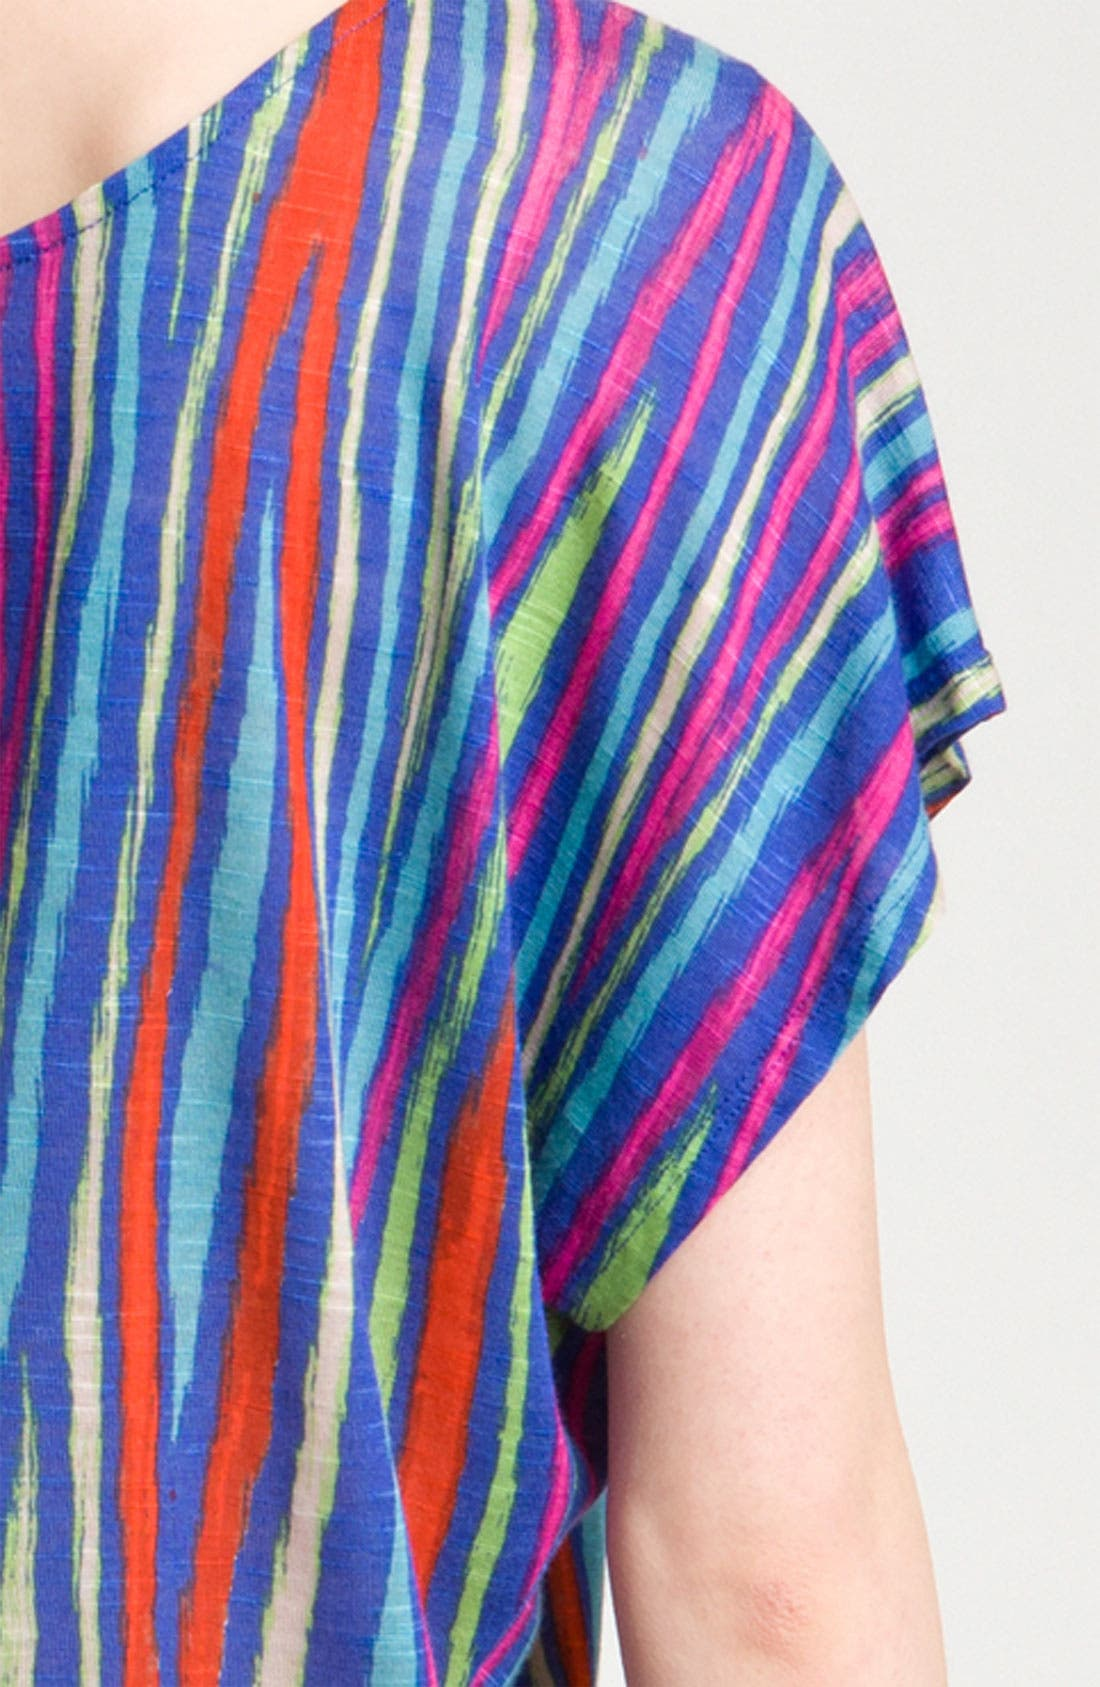 Alternate Image 3  - Ella Moss 'Kahlo' Slouchy Ikat Print Top